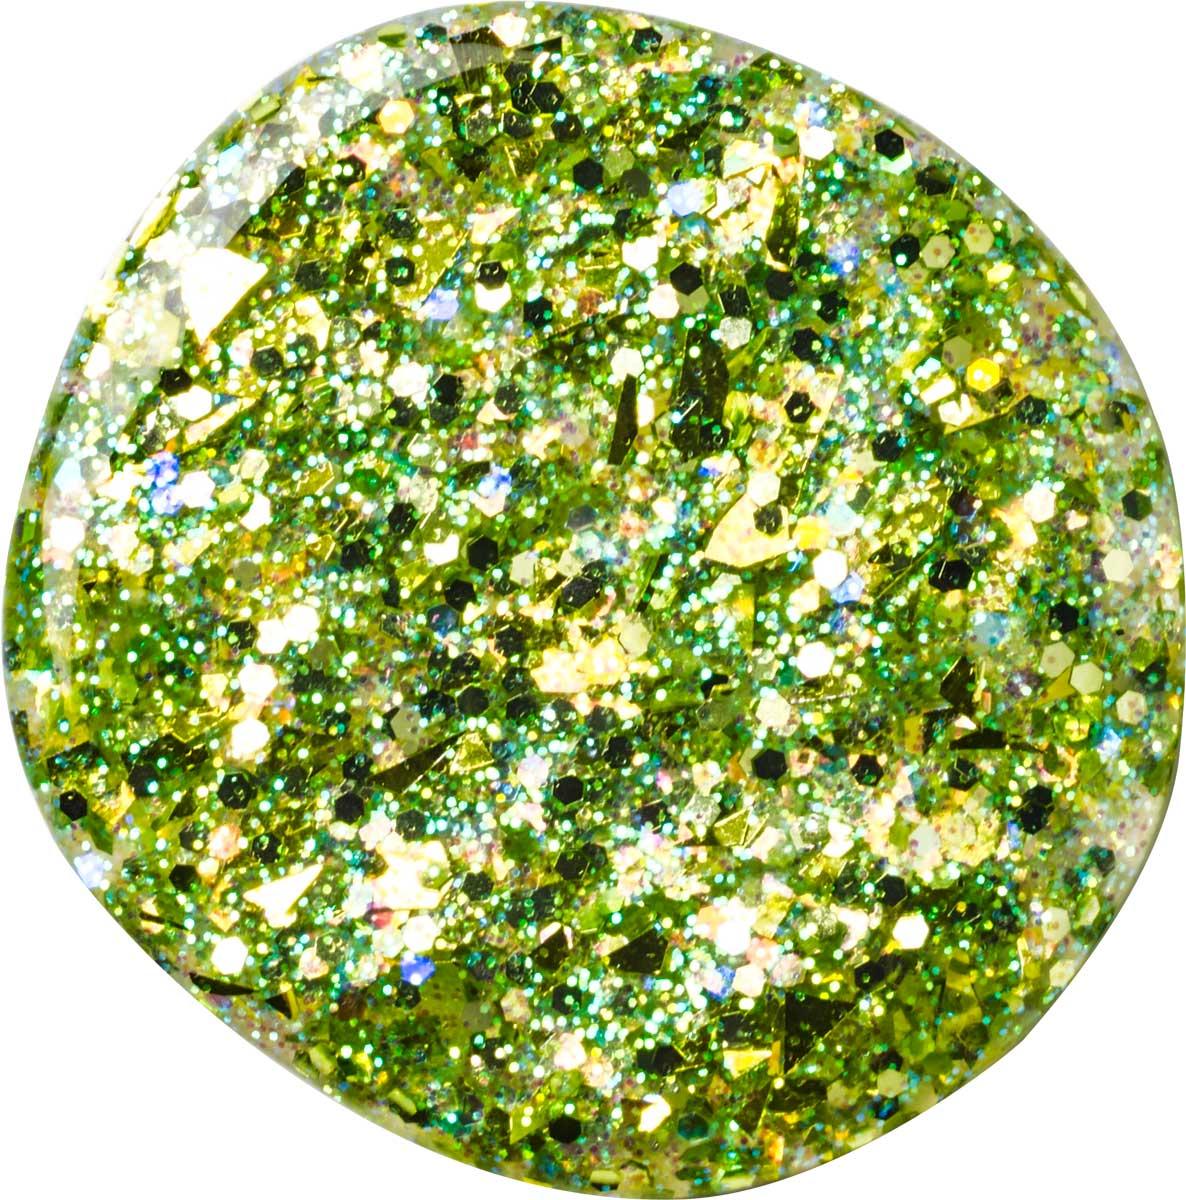 FolkArt ® Glitterific™ Acrylic Paint - Green, 2 oz. - 5880